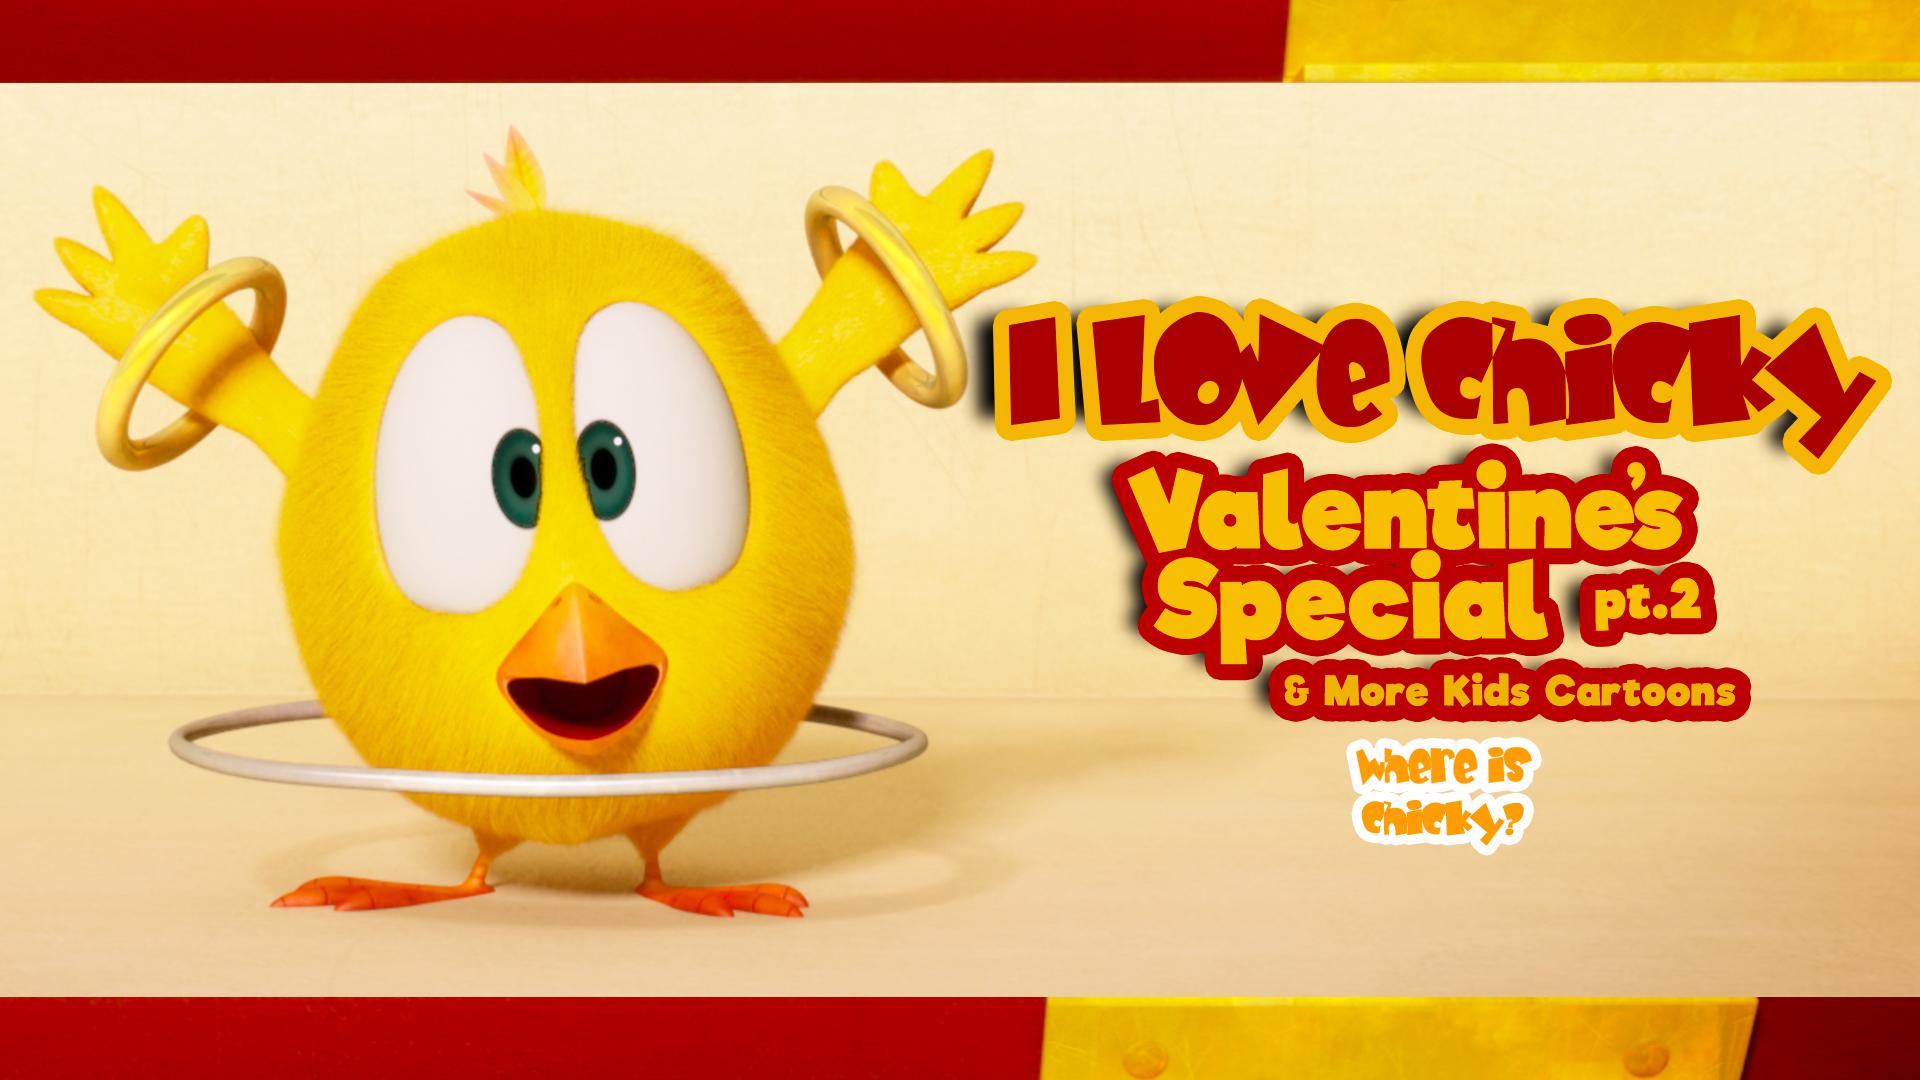 Chicky - I love Chicky Valentine's Special Pt.2 - & More Kids Cartoons